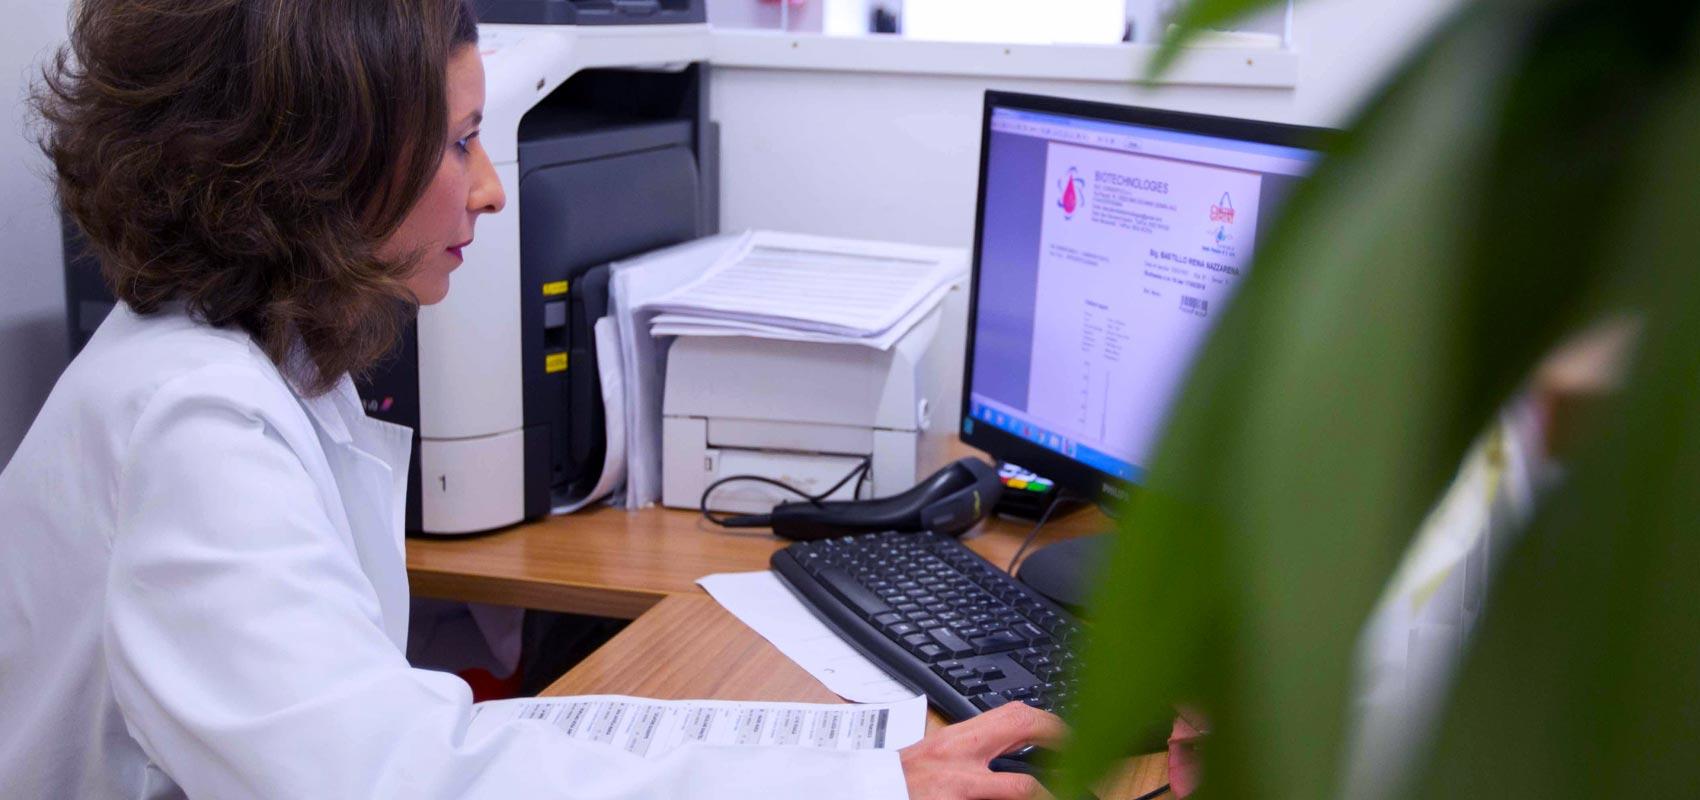 analisi-mediche-laboratorio-biotechnologies-agrigento-caltanissetta-san-giovanni-gemini-mussomeli-esami-sangue-emocromo-urine-3